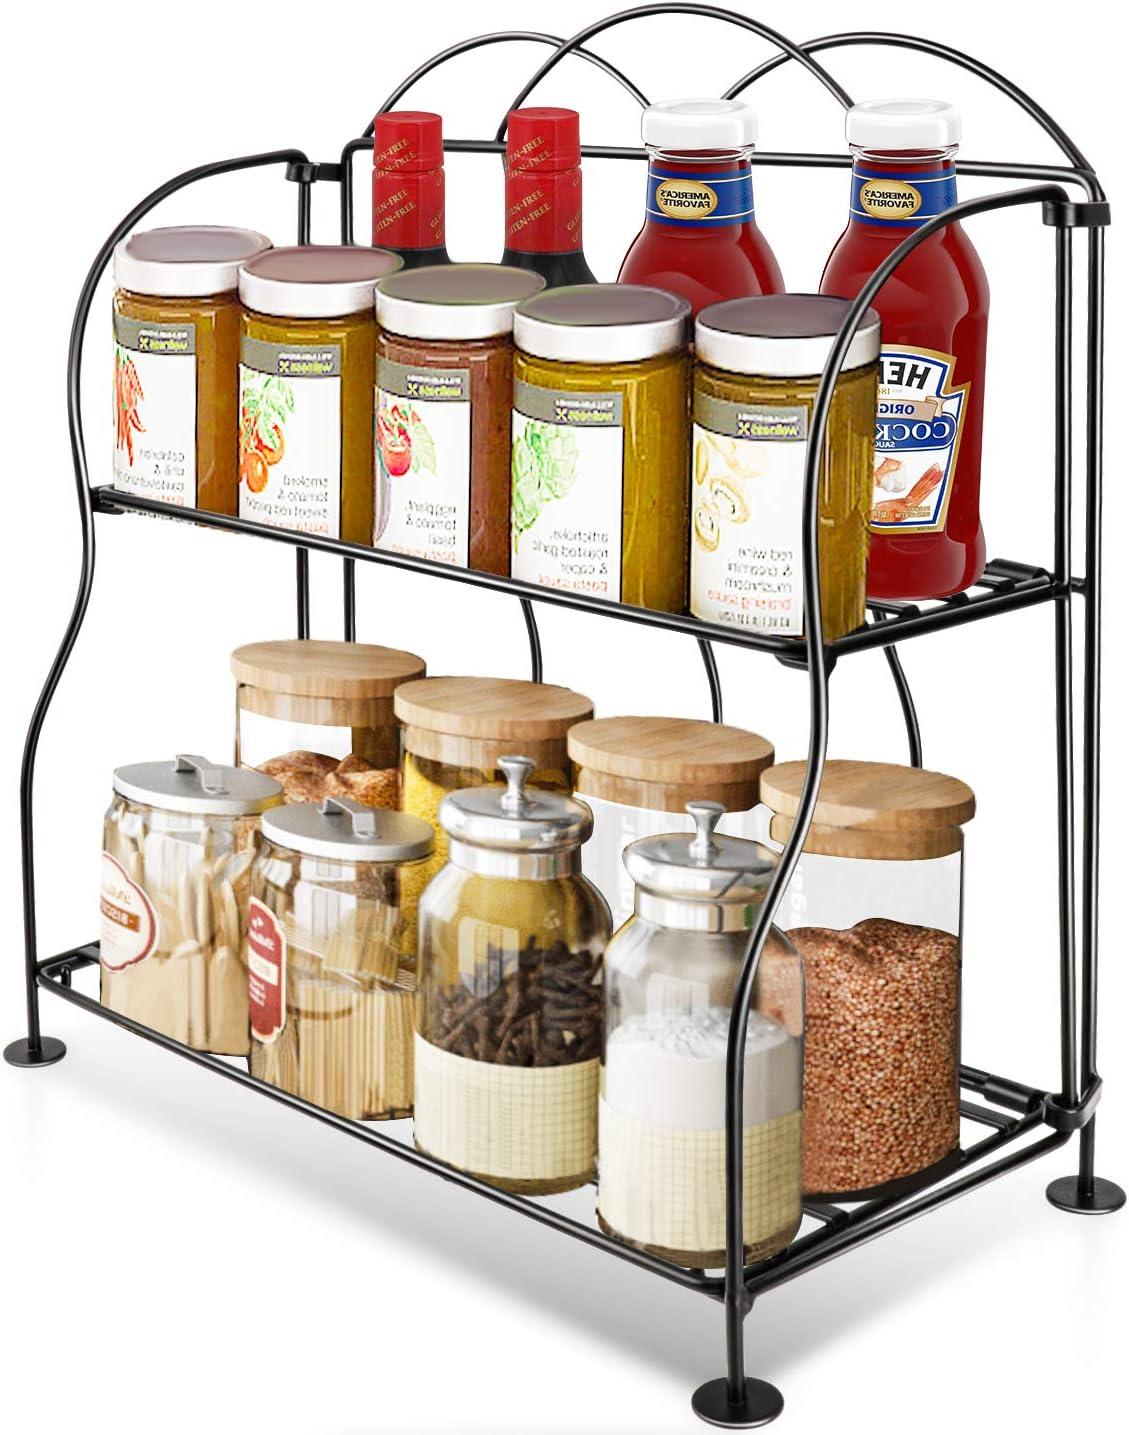 Spice Rack Organizer,2-Tier Foldable Standing Storage Organizer, Kitchen Bathroom Office Countertops Shelf Spice Jar Bottle Holder -Black